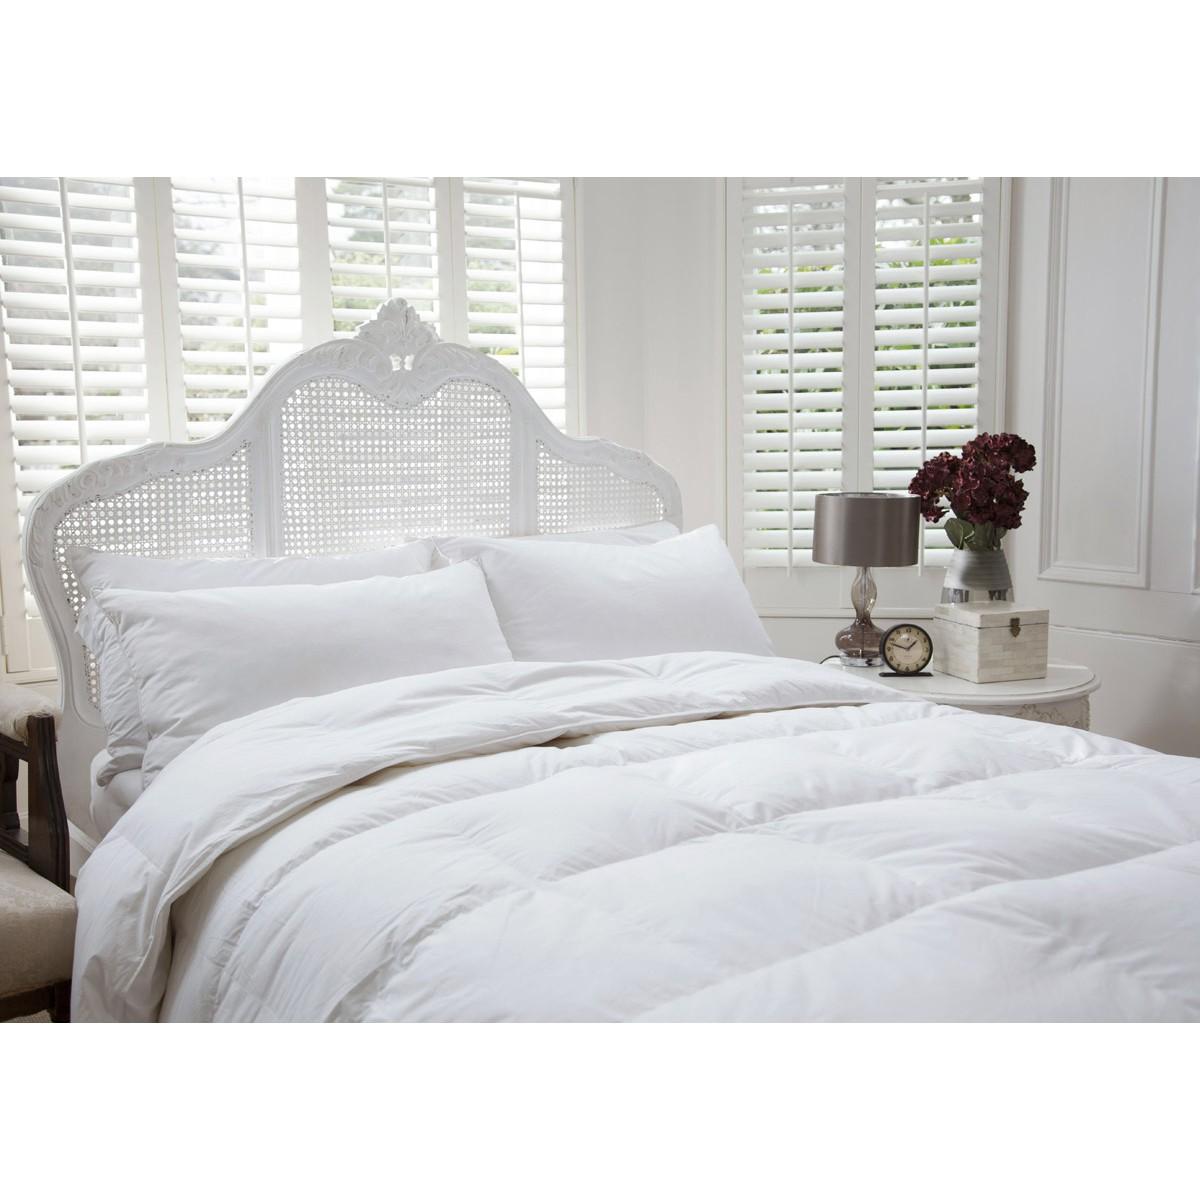 Single air mattress walmart decor ideasdecor ideas for Air bed decoration